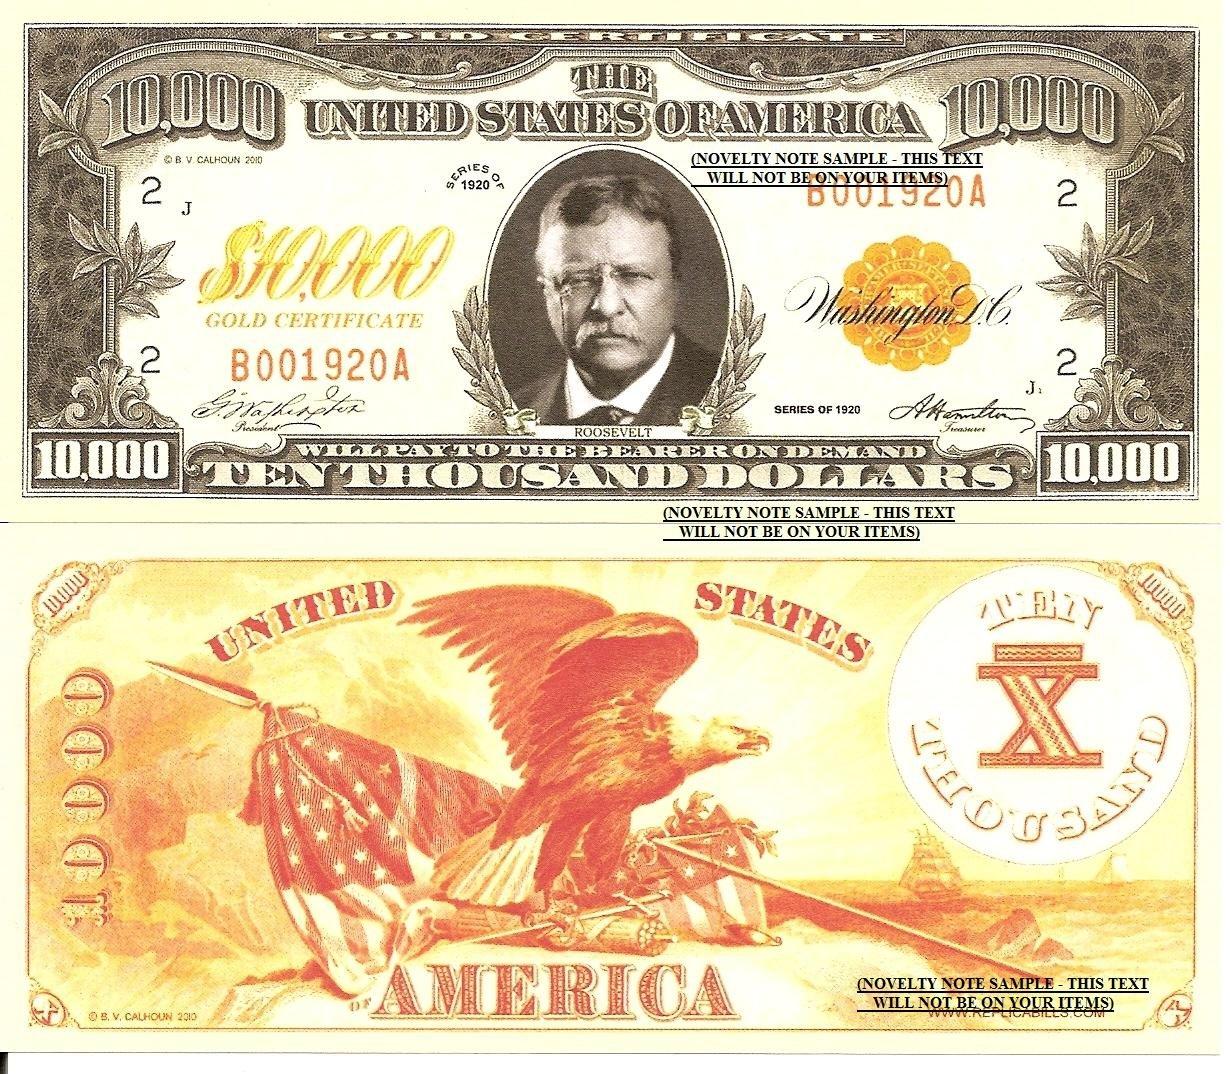 New 10000 Dollar Bill Roosevelt Gold Certifi...